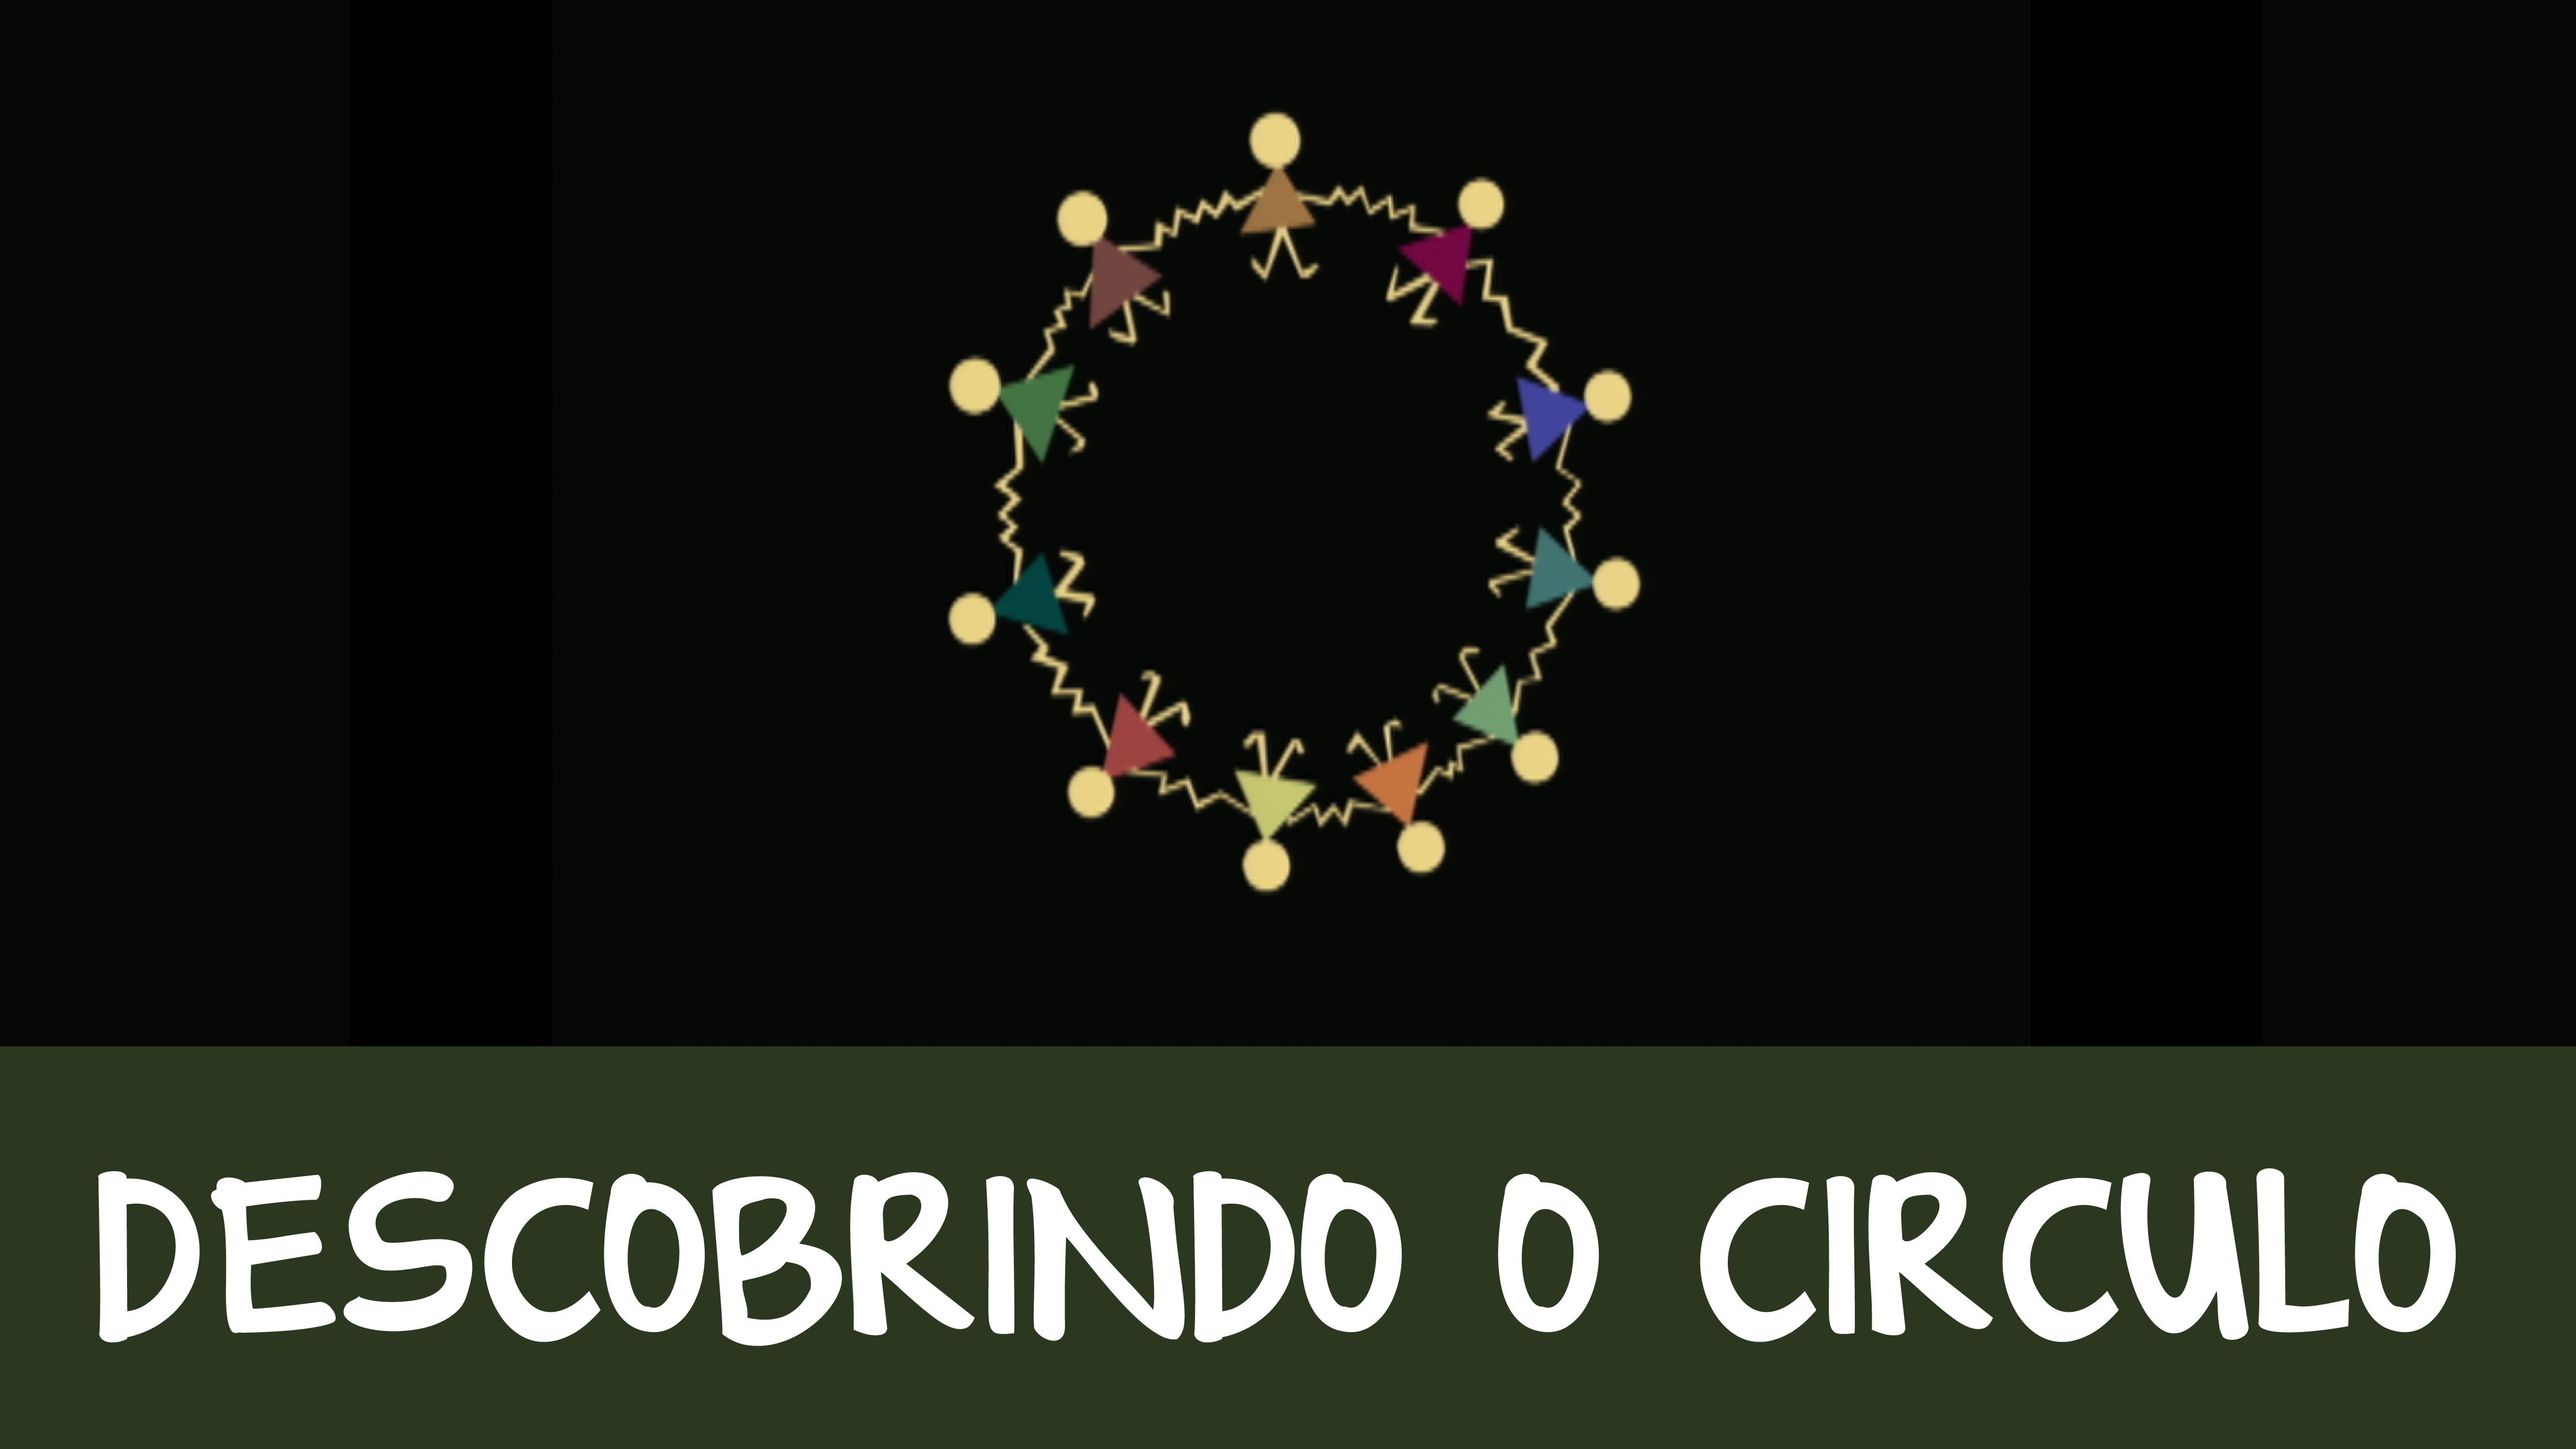 bbm_capa_descobrindo_o_circulo-01